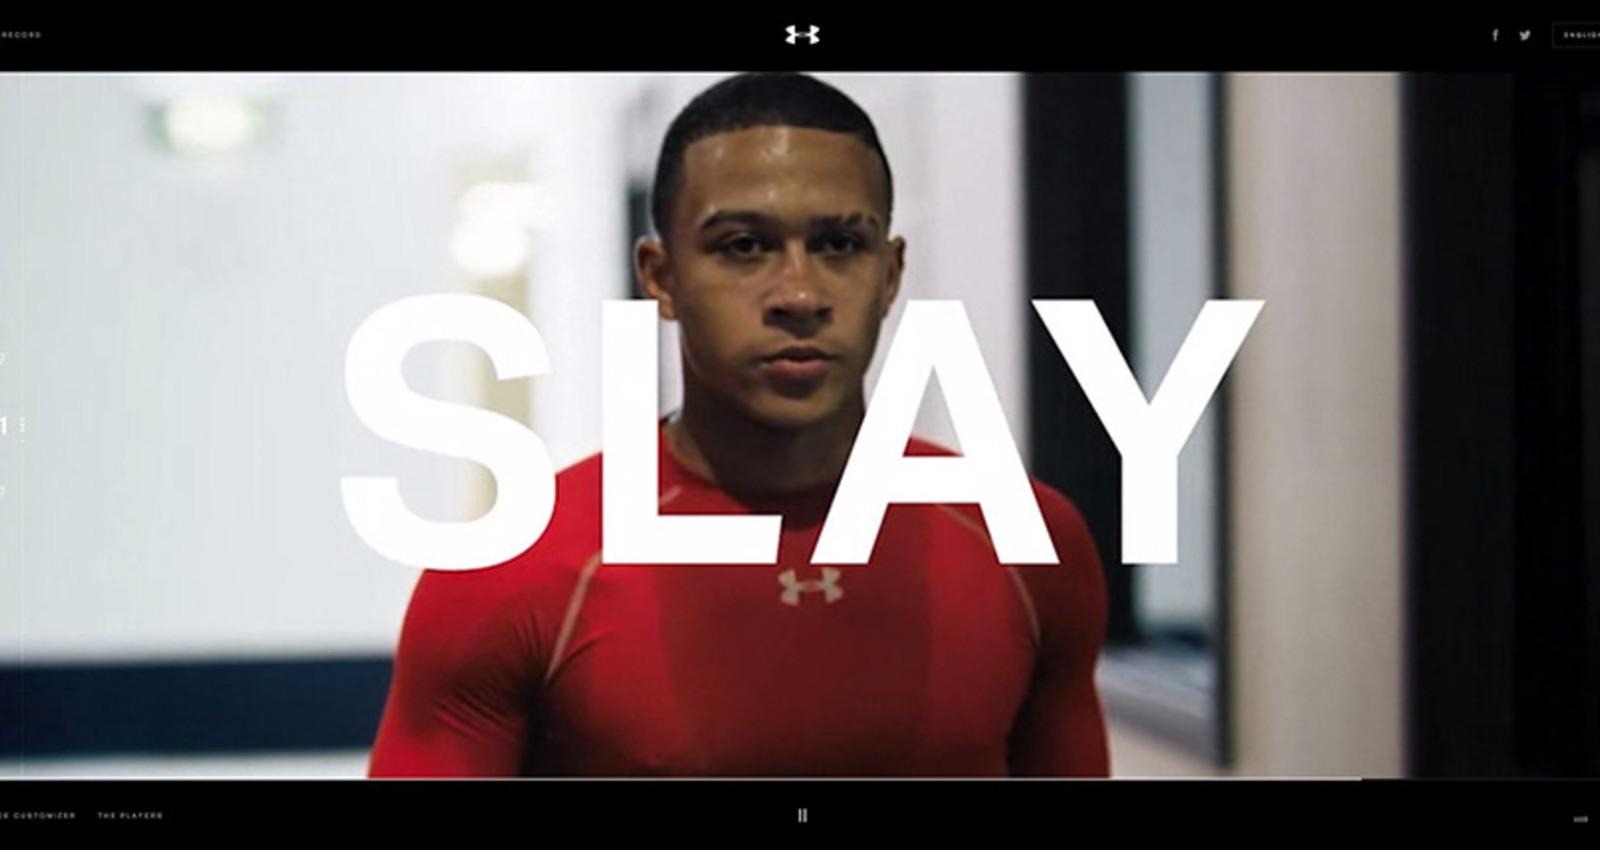 Slay Your Next Giant